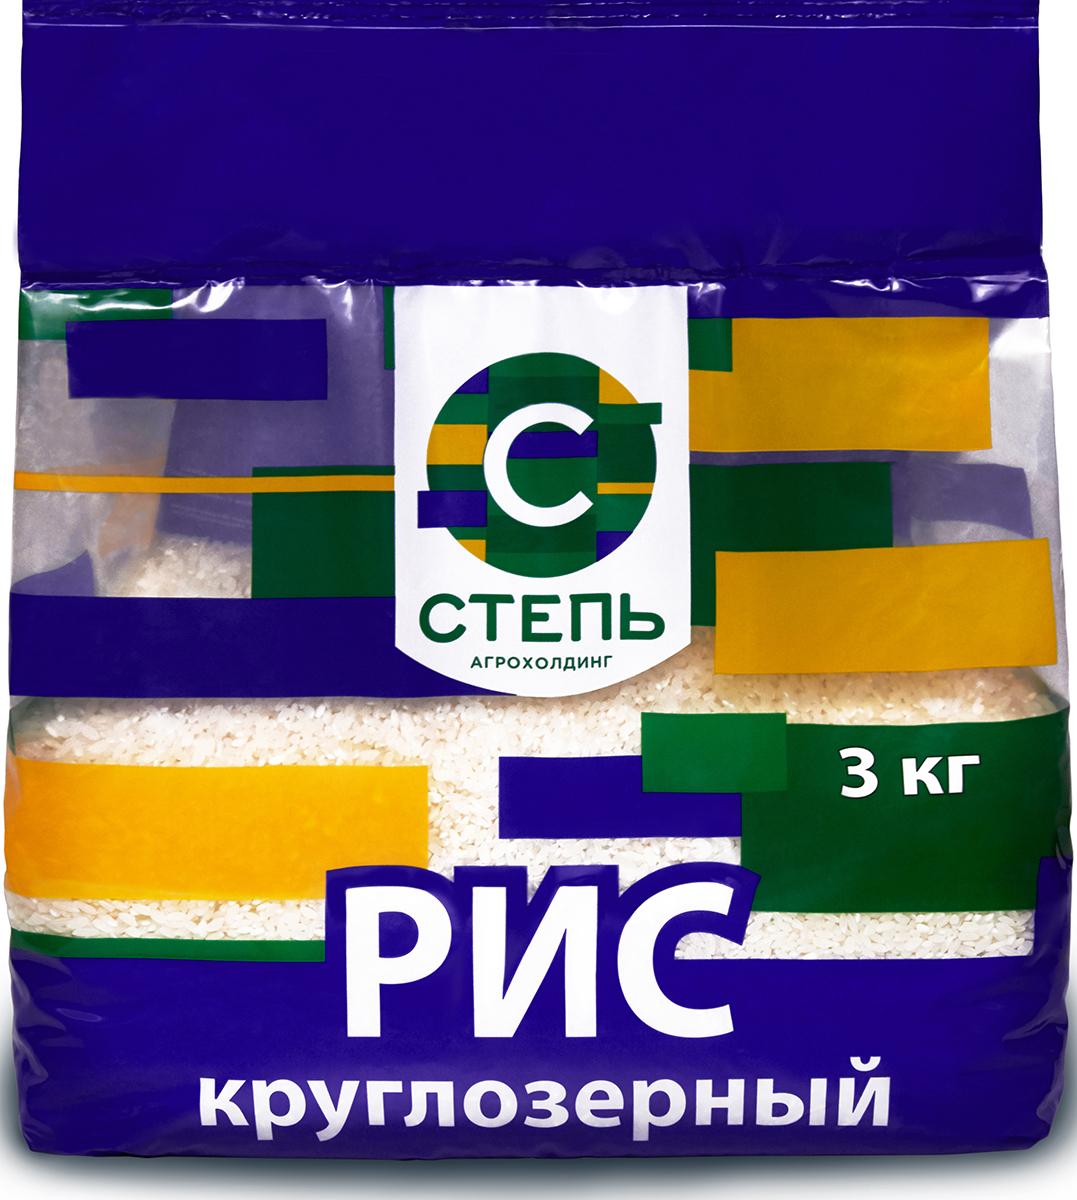 "Крупа рис круглозерный Агрохолдинг ""СТЕПЬ"" 3кг"